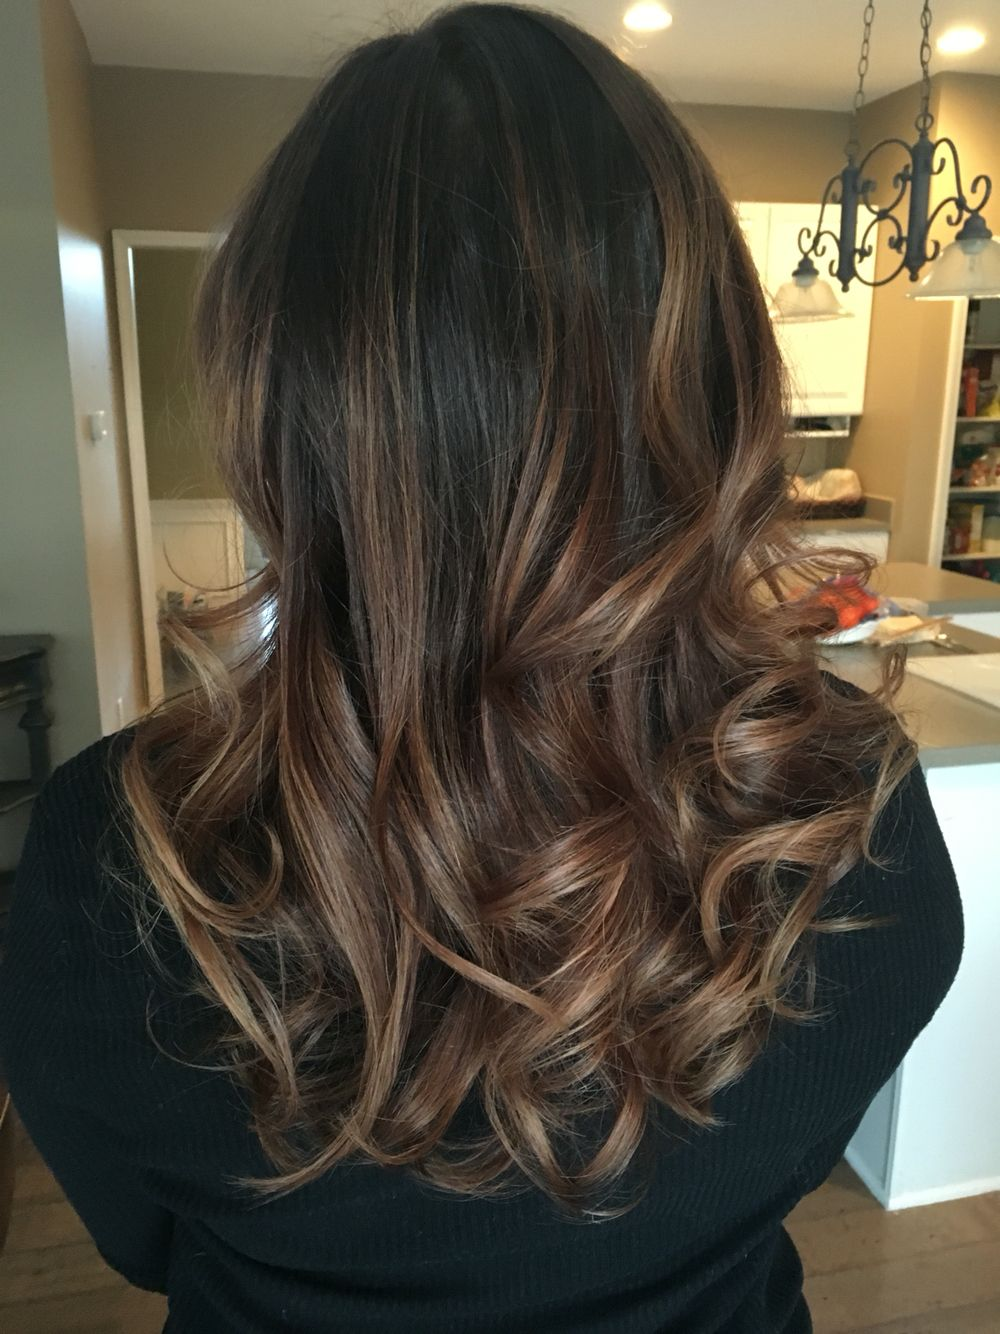 Balayage medium brown - Thank you Salon Bliss! | fashion ...